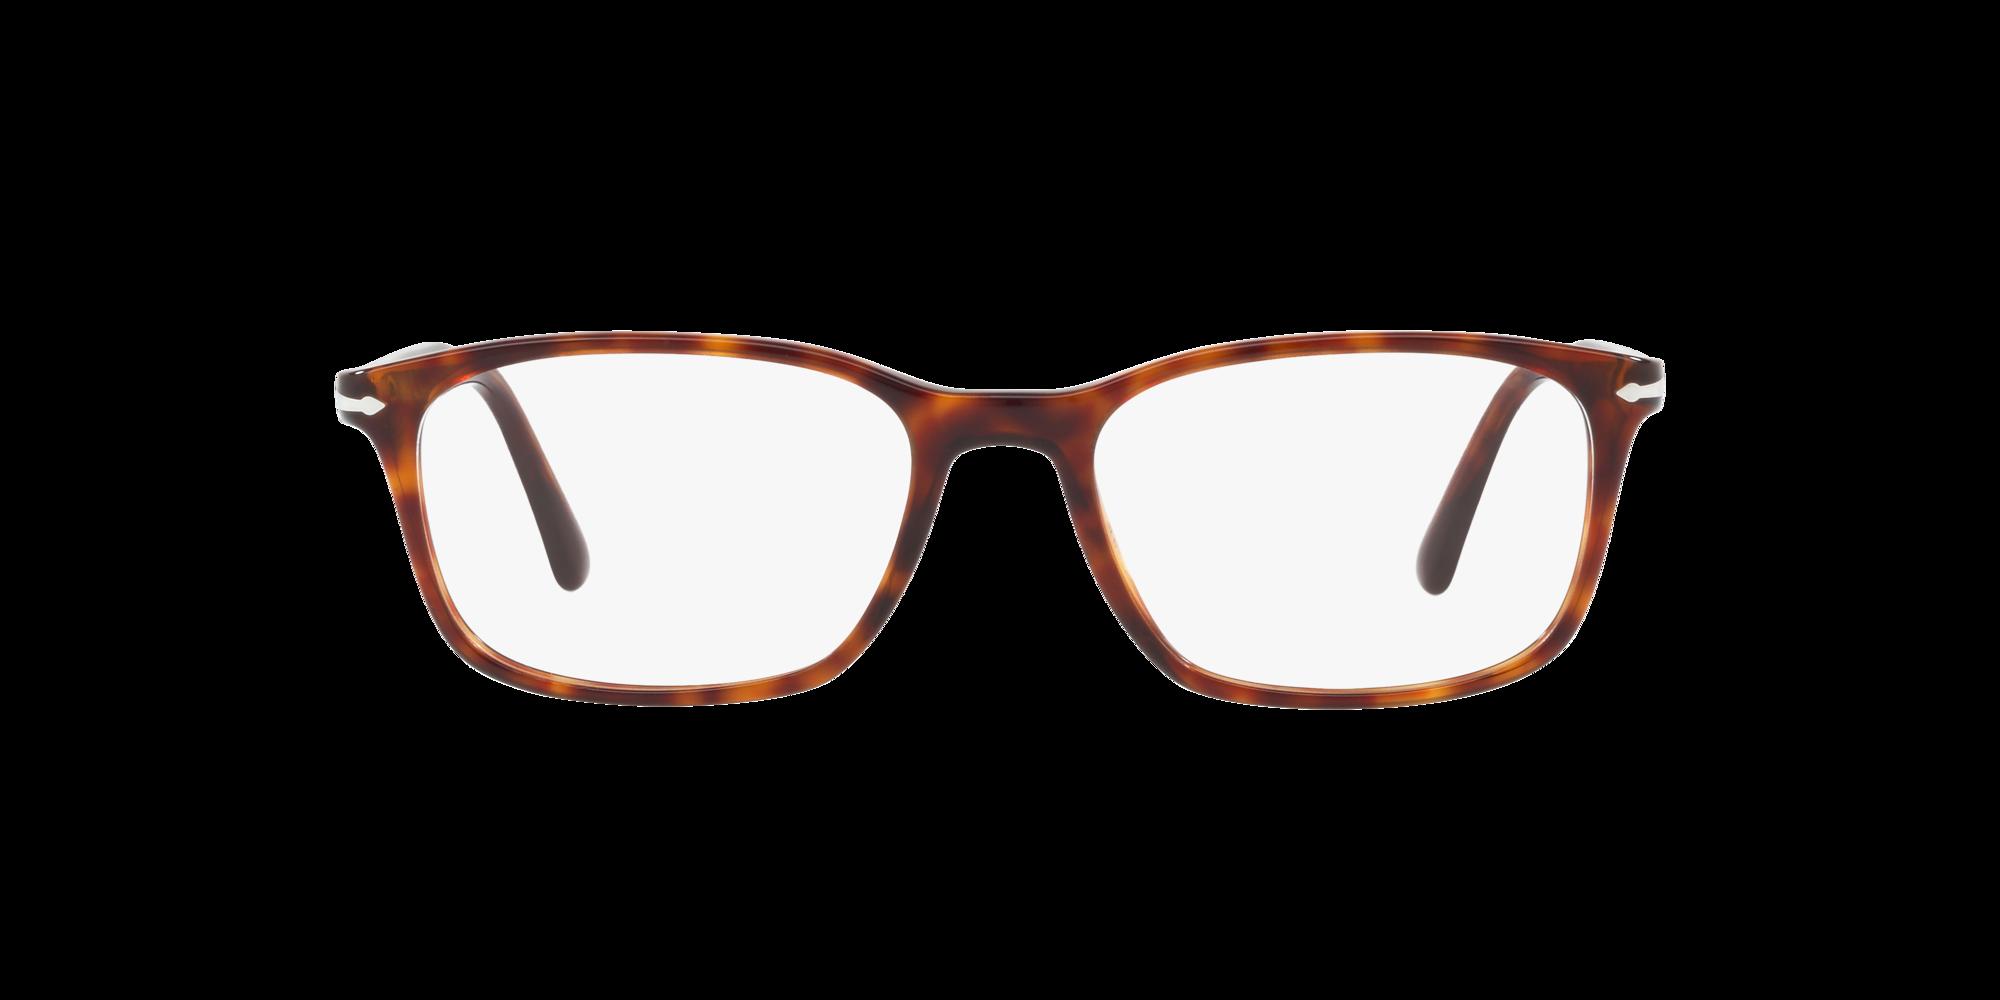 Image for PO3189V from LensCrafters | Glasses, Prescription Glasses Online, Eyewear